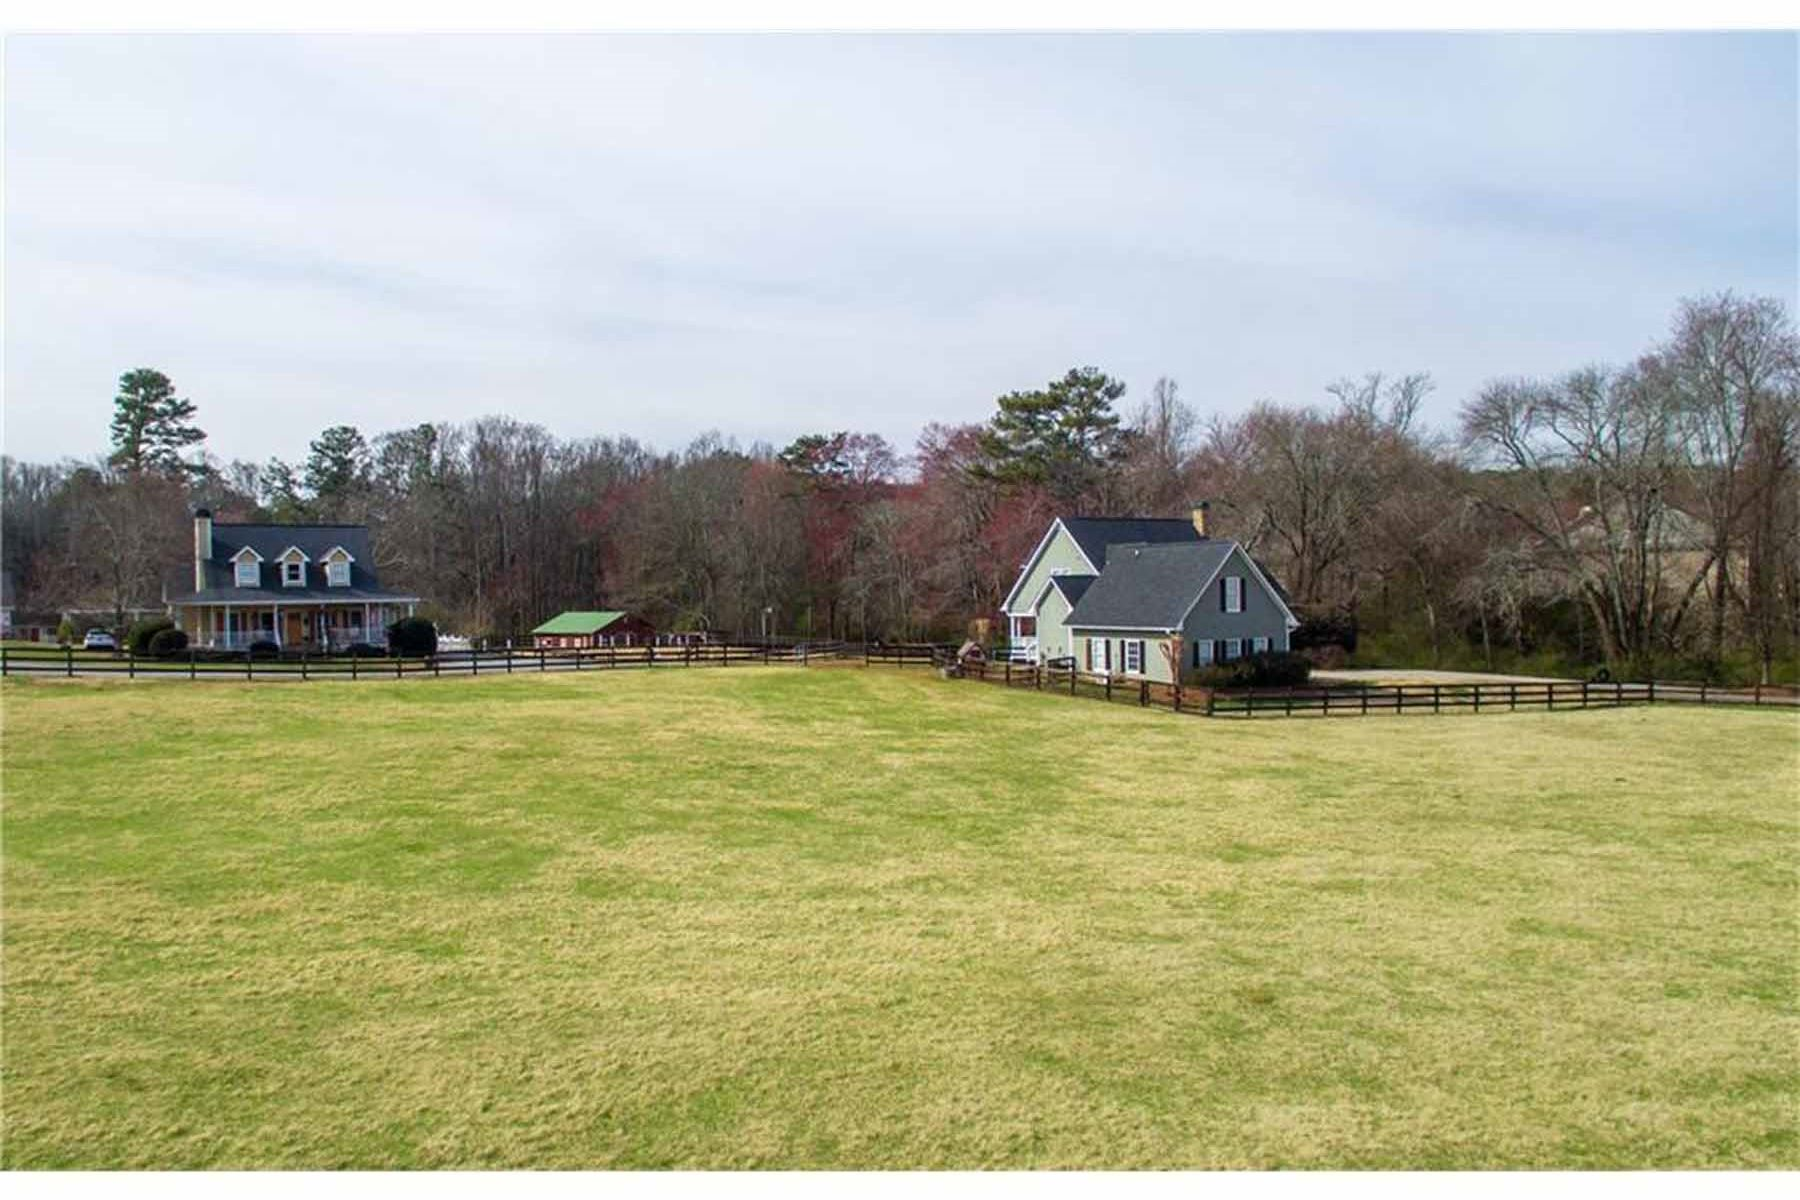 Nhà ở một gia đình vì Bán tại PEACEFUL TWO HOME, 7 ACRE ESTATE CLOSE TO HISTORIC ALPHARETTA & CRABAPPLE 1225 Mid Broadwell Road Alpharetta, Georgia, 30004 Hoa Kỳ